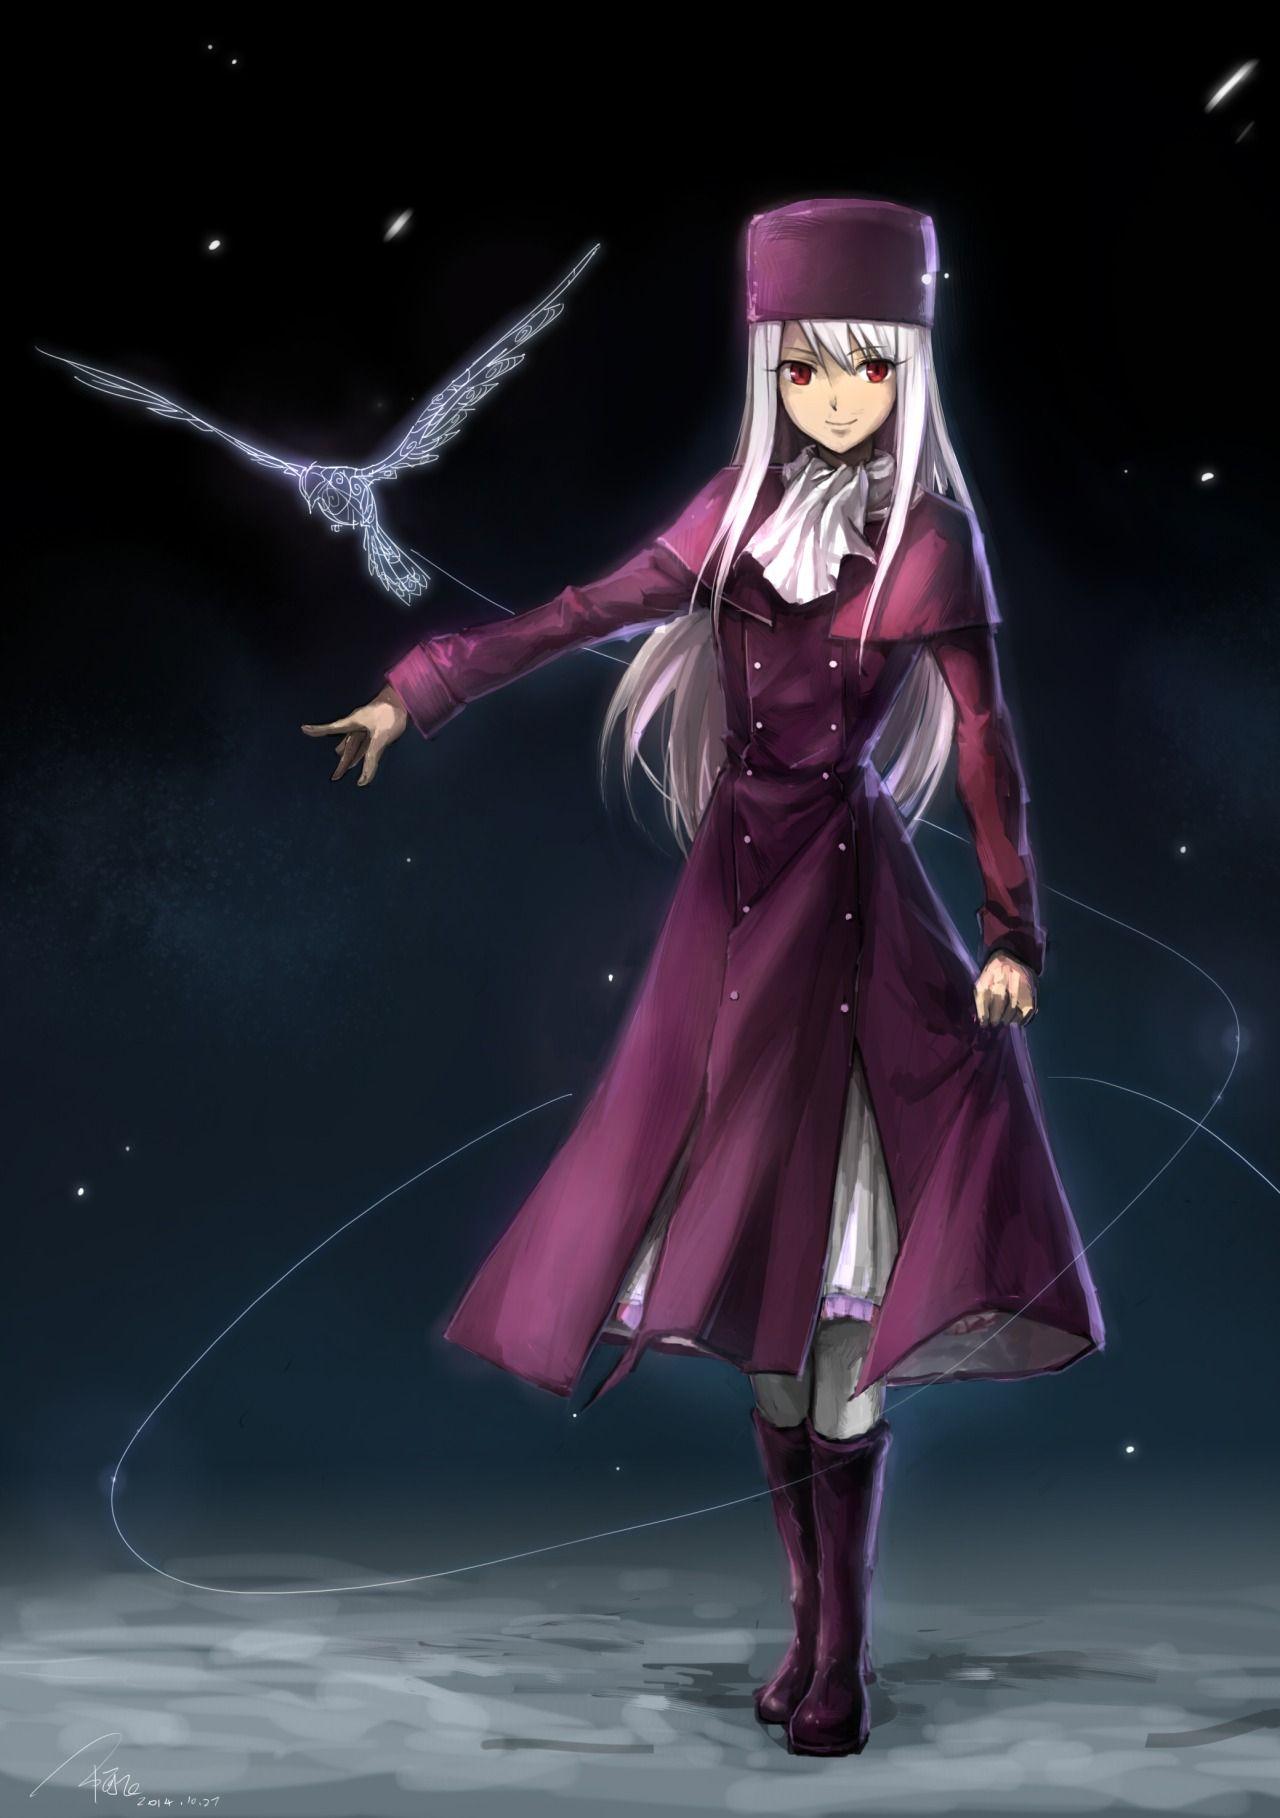 Older Illya Fate stay night, Fate anime series, Fate zero